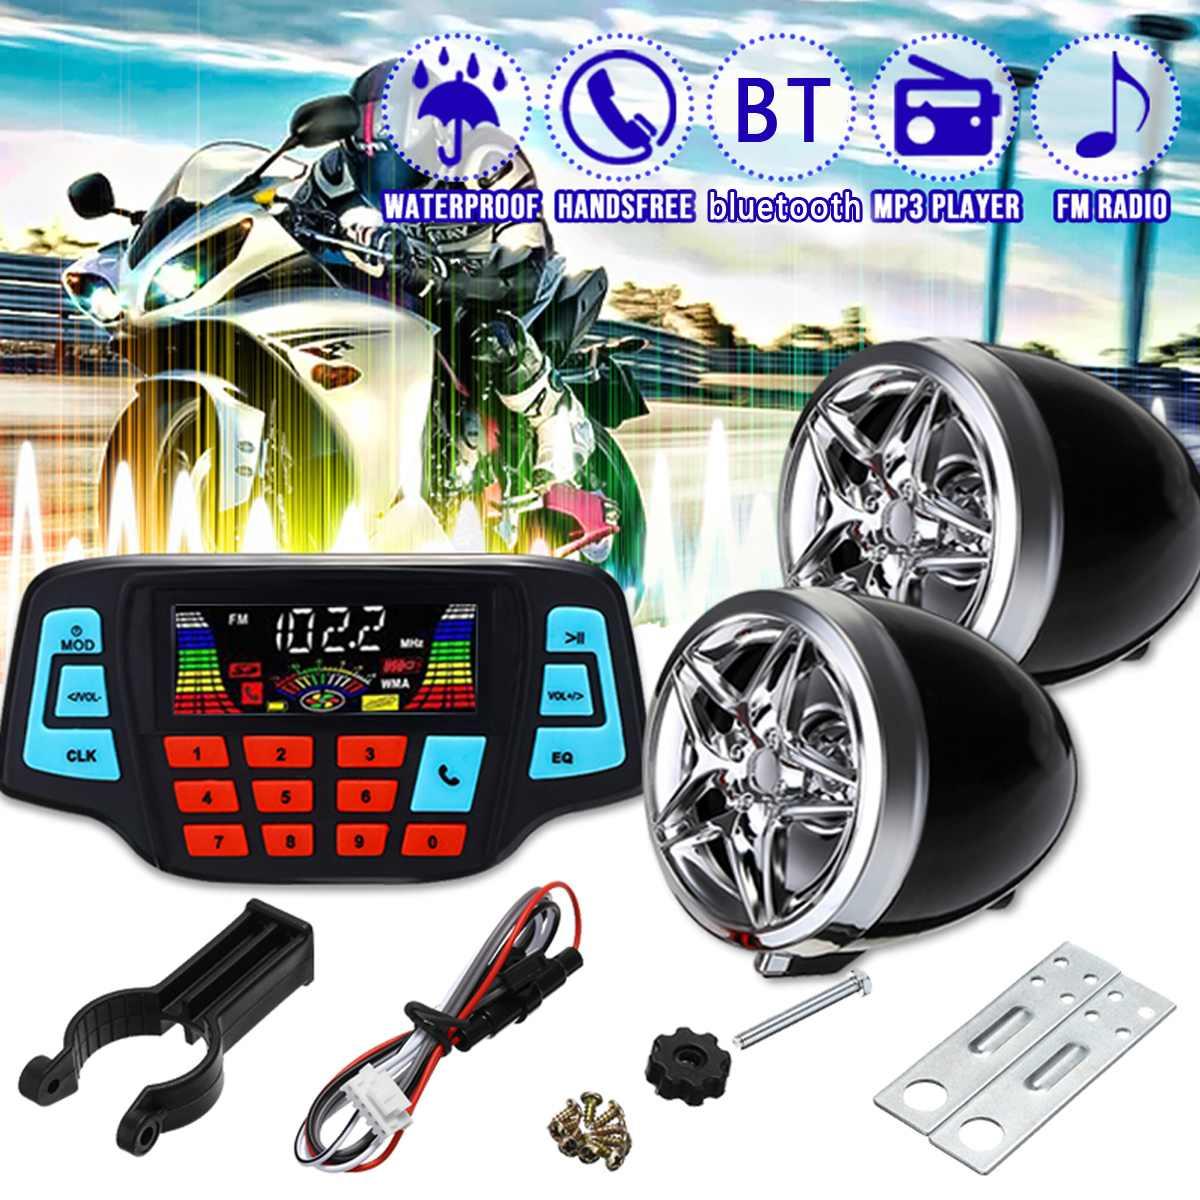 Motorcycle Waterproof MP3 Speakers Motor Handlebar Audio System USB TF Bluetooth FM Radio Built-in Microphone Car Accessories